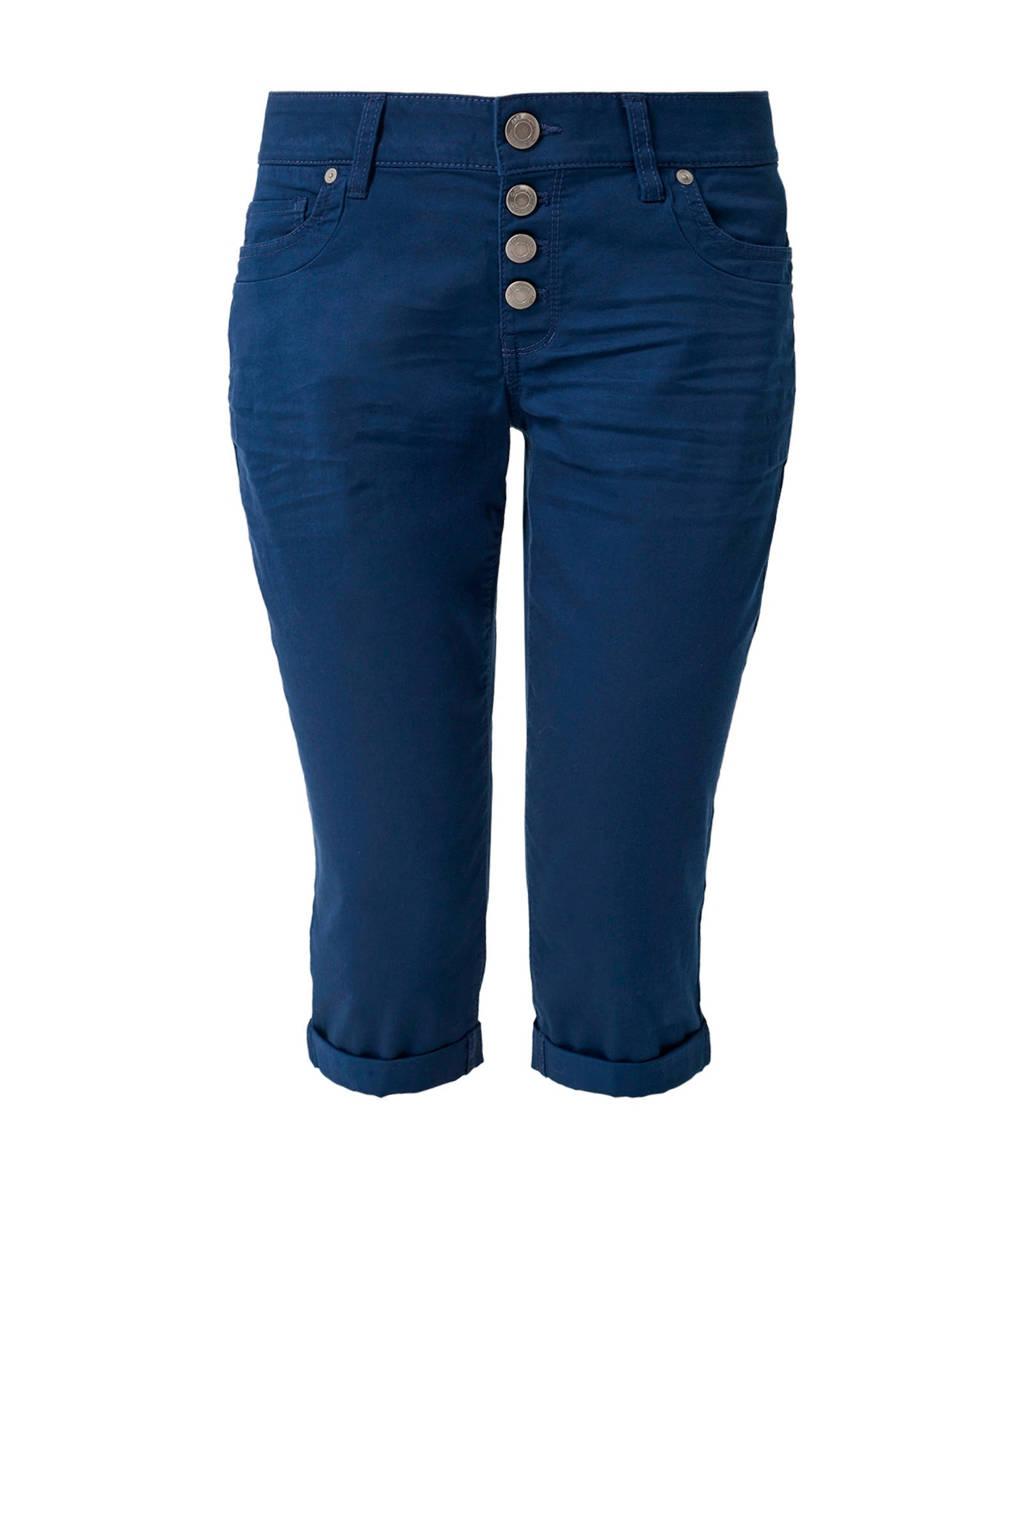 Q/S designed by slim fit capri donkerblauw, Donkerblauw